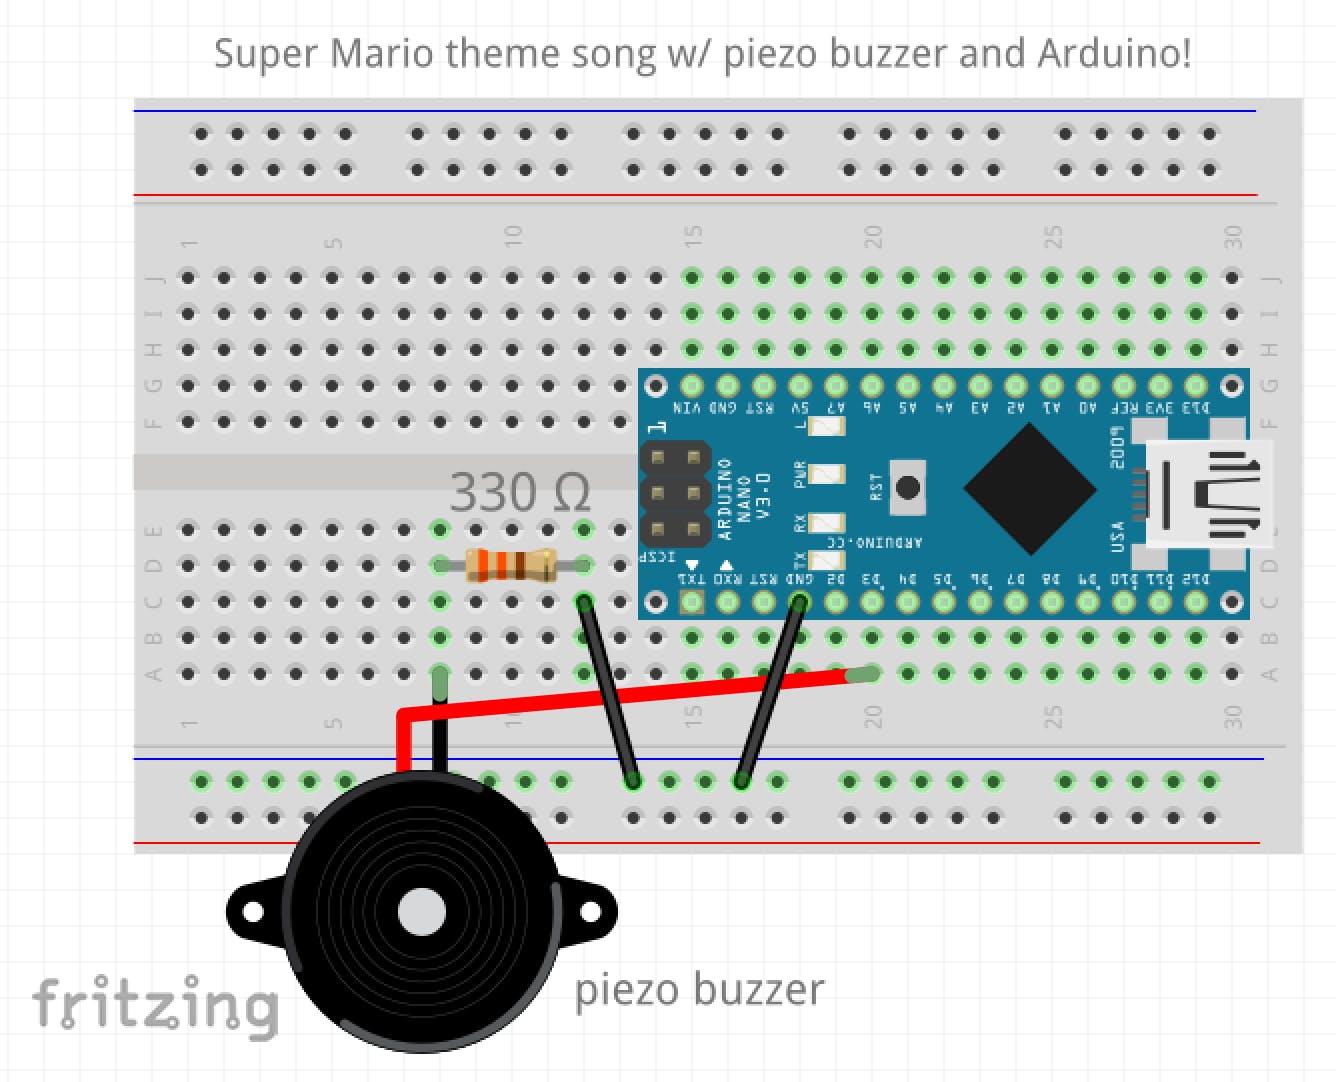 Fritzing schematics in order to connect the Arduino Nano/UNO to a piezo buzzer.